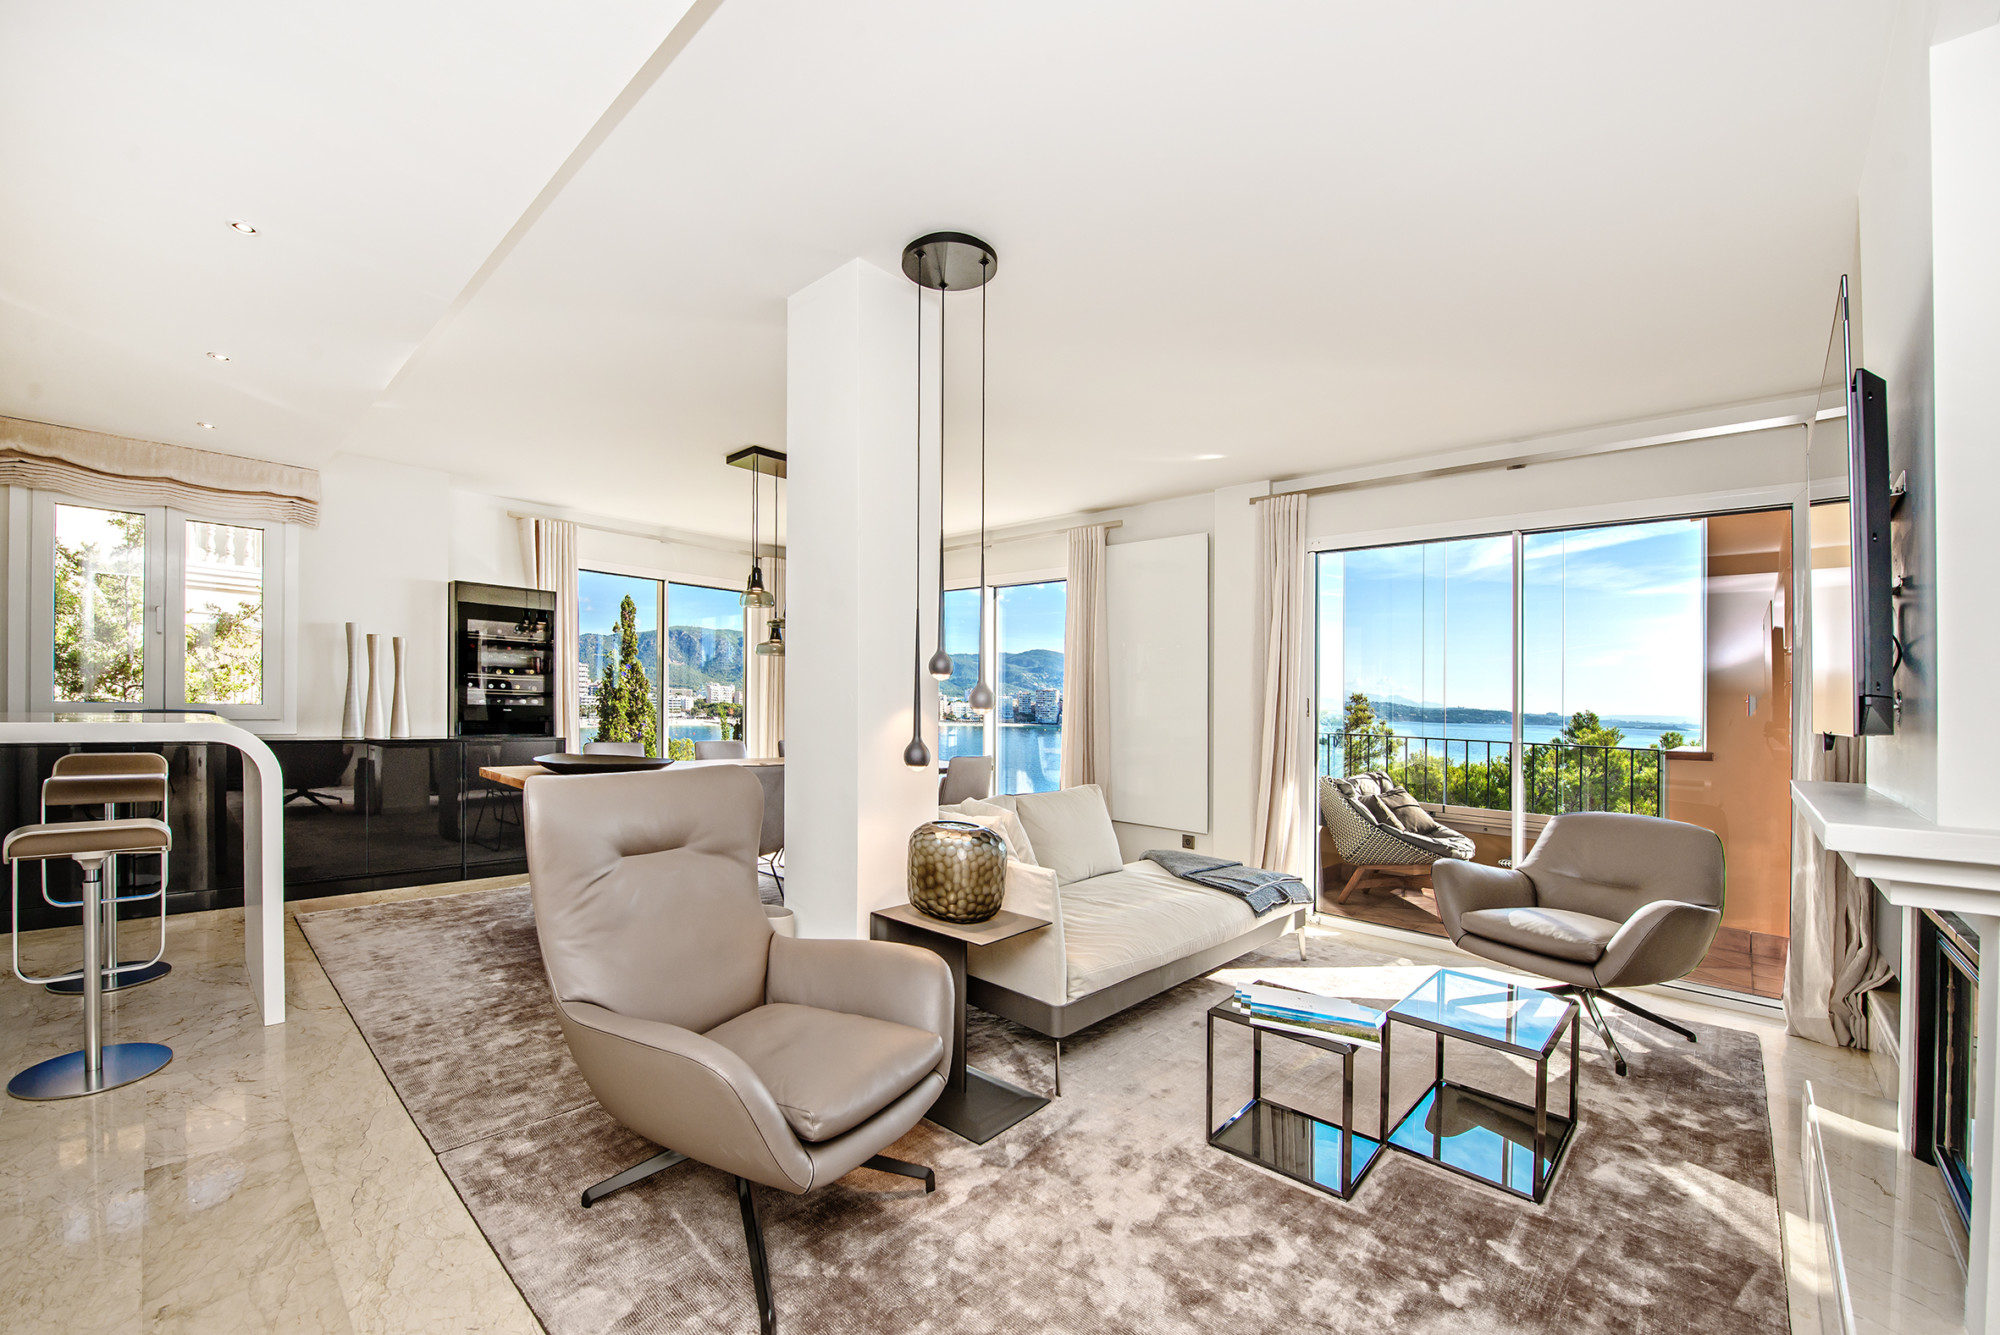 Design-Wohnung-Luxus-Meerblick-Apartment